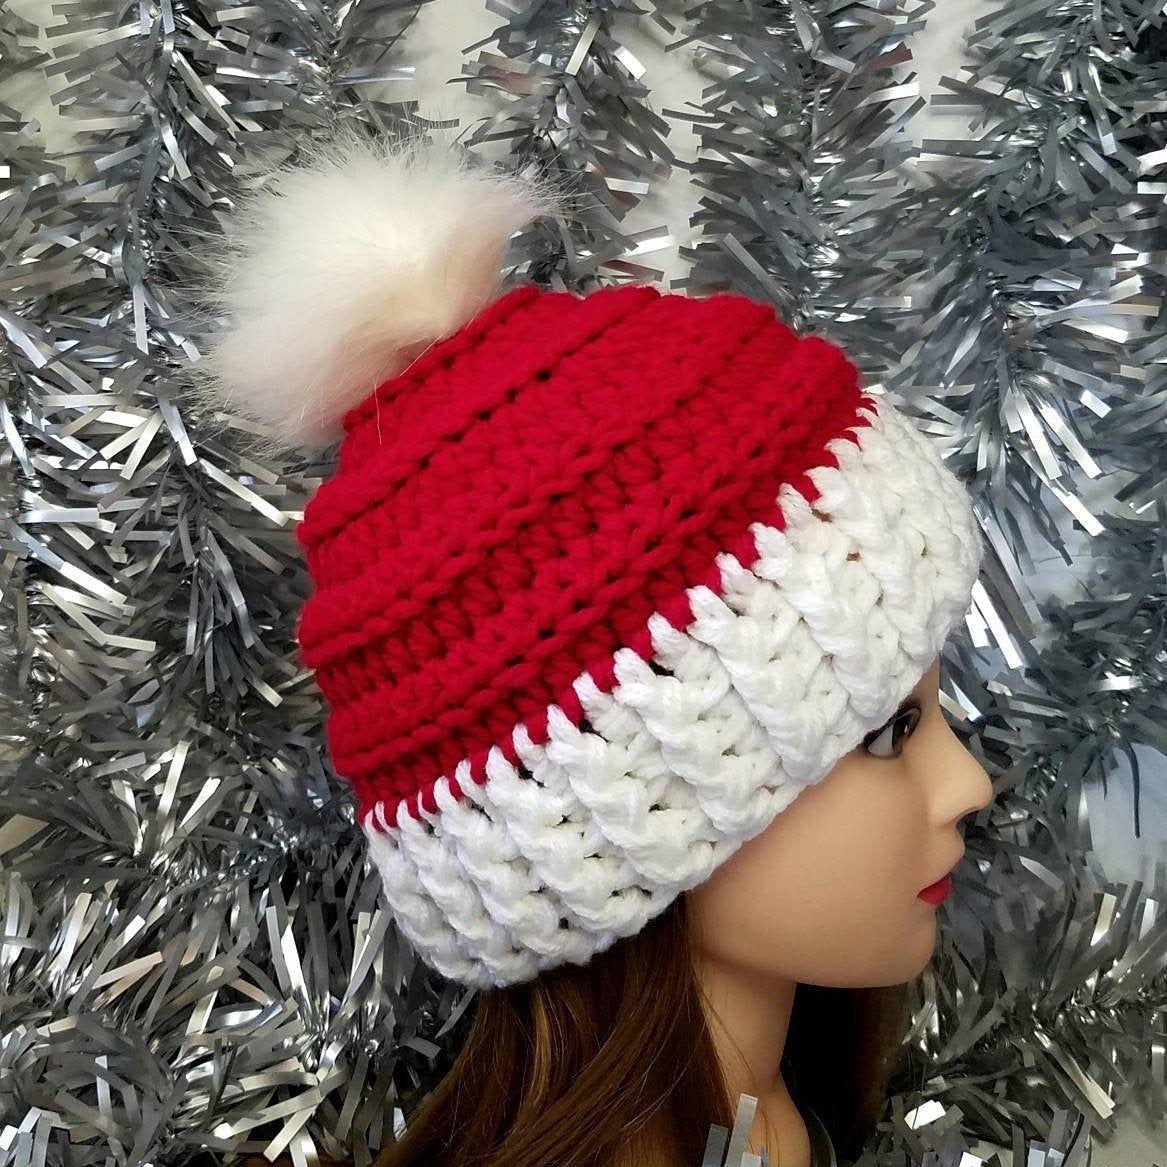 Crochet Santa Beanie - Fits 6 years-Adult Small (21